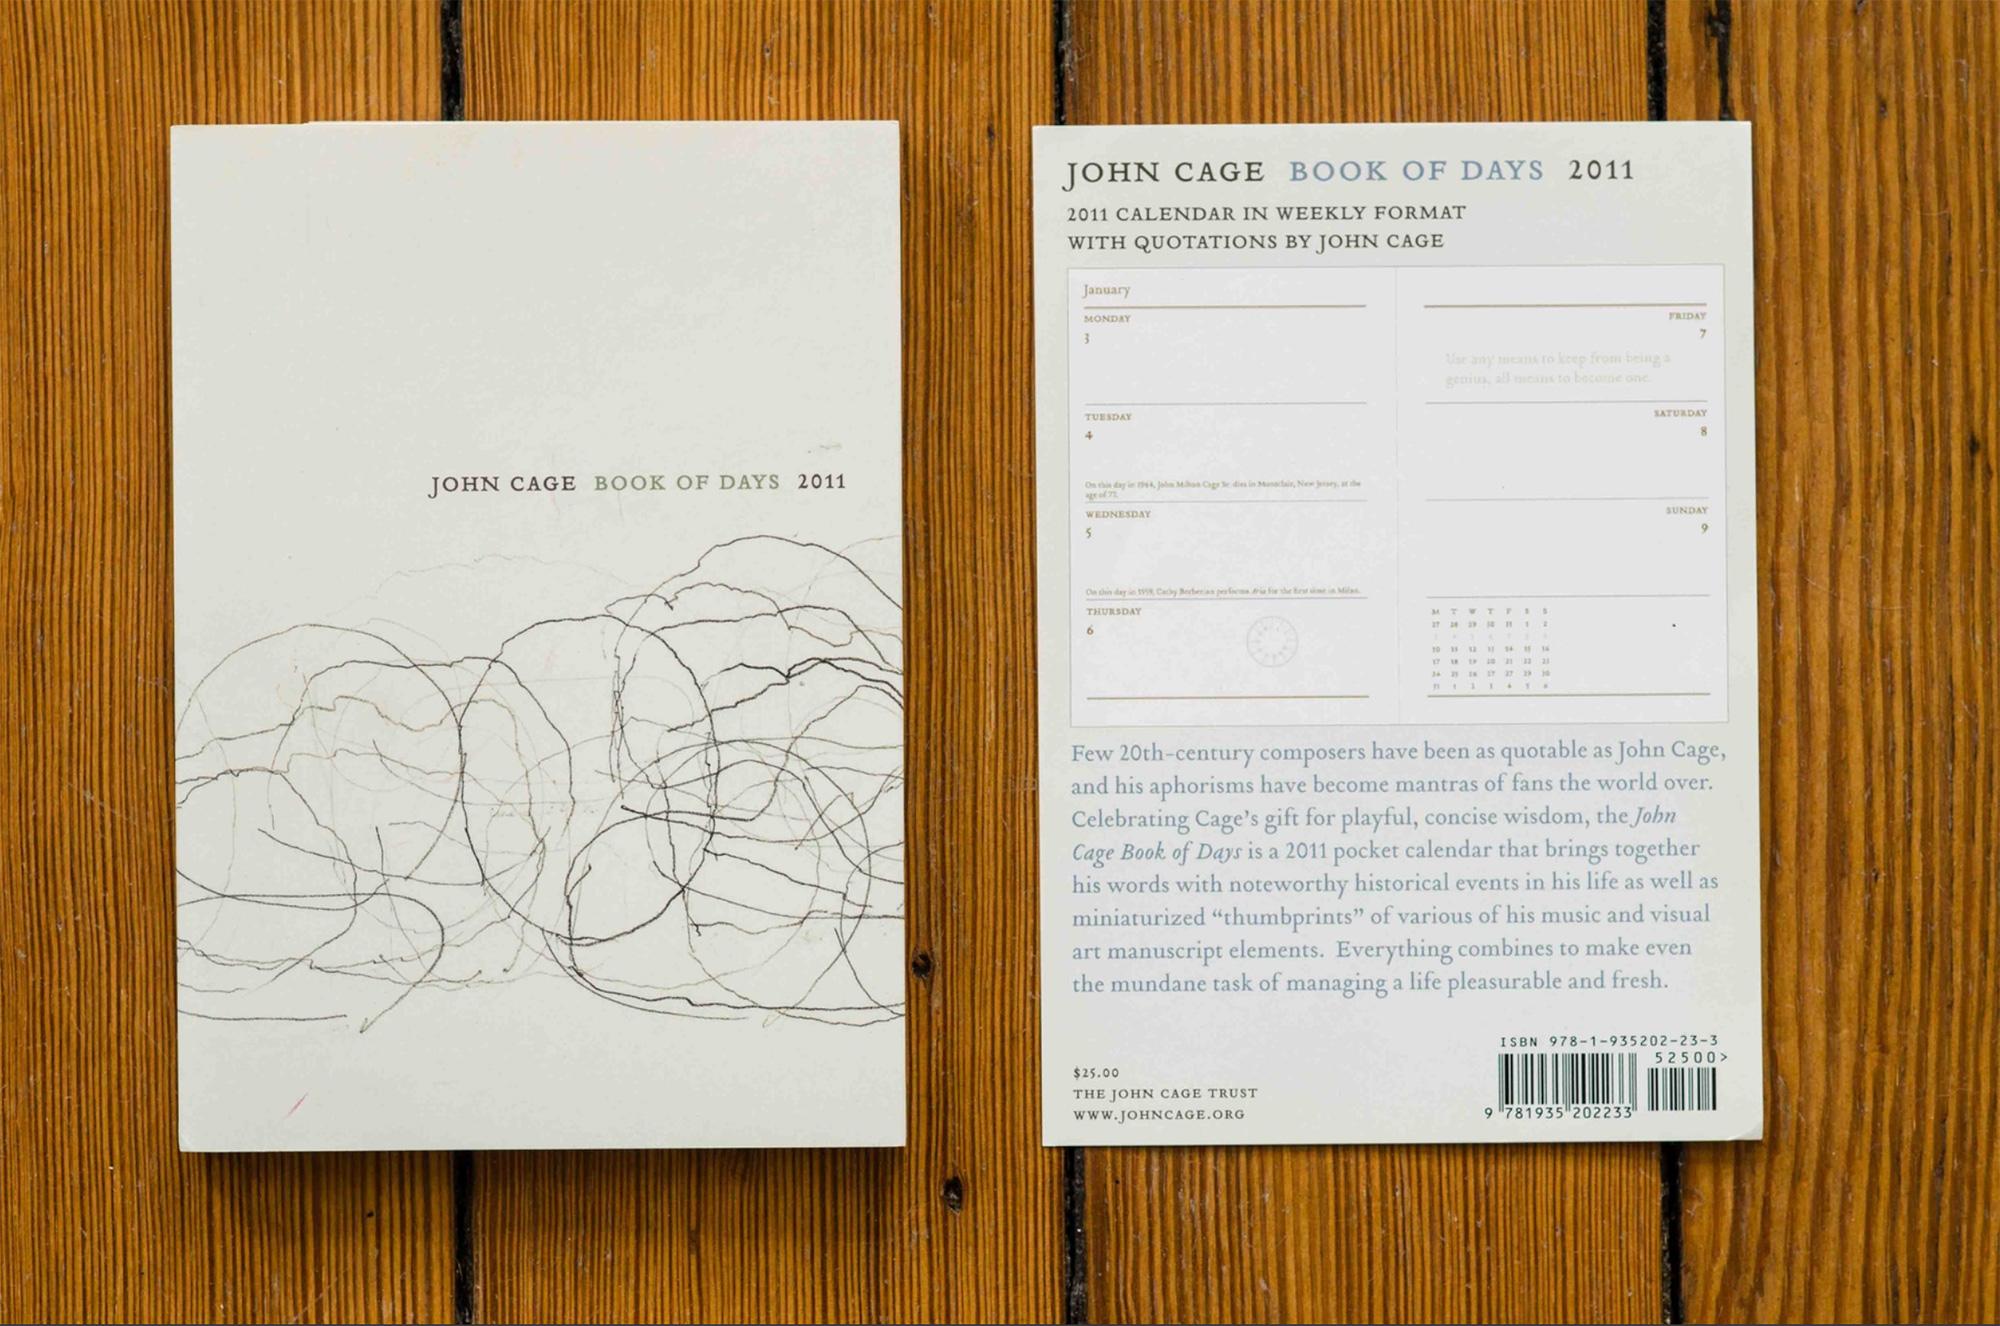 John Cage Book of Days Calendar